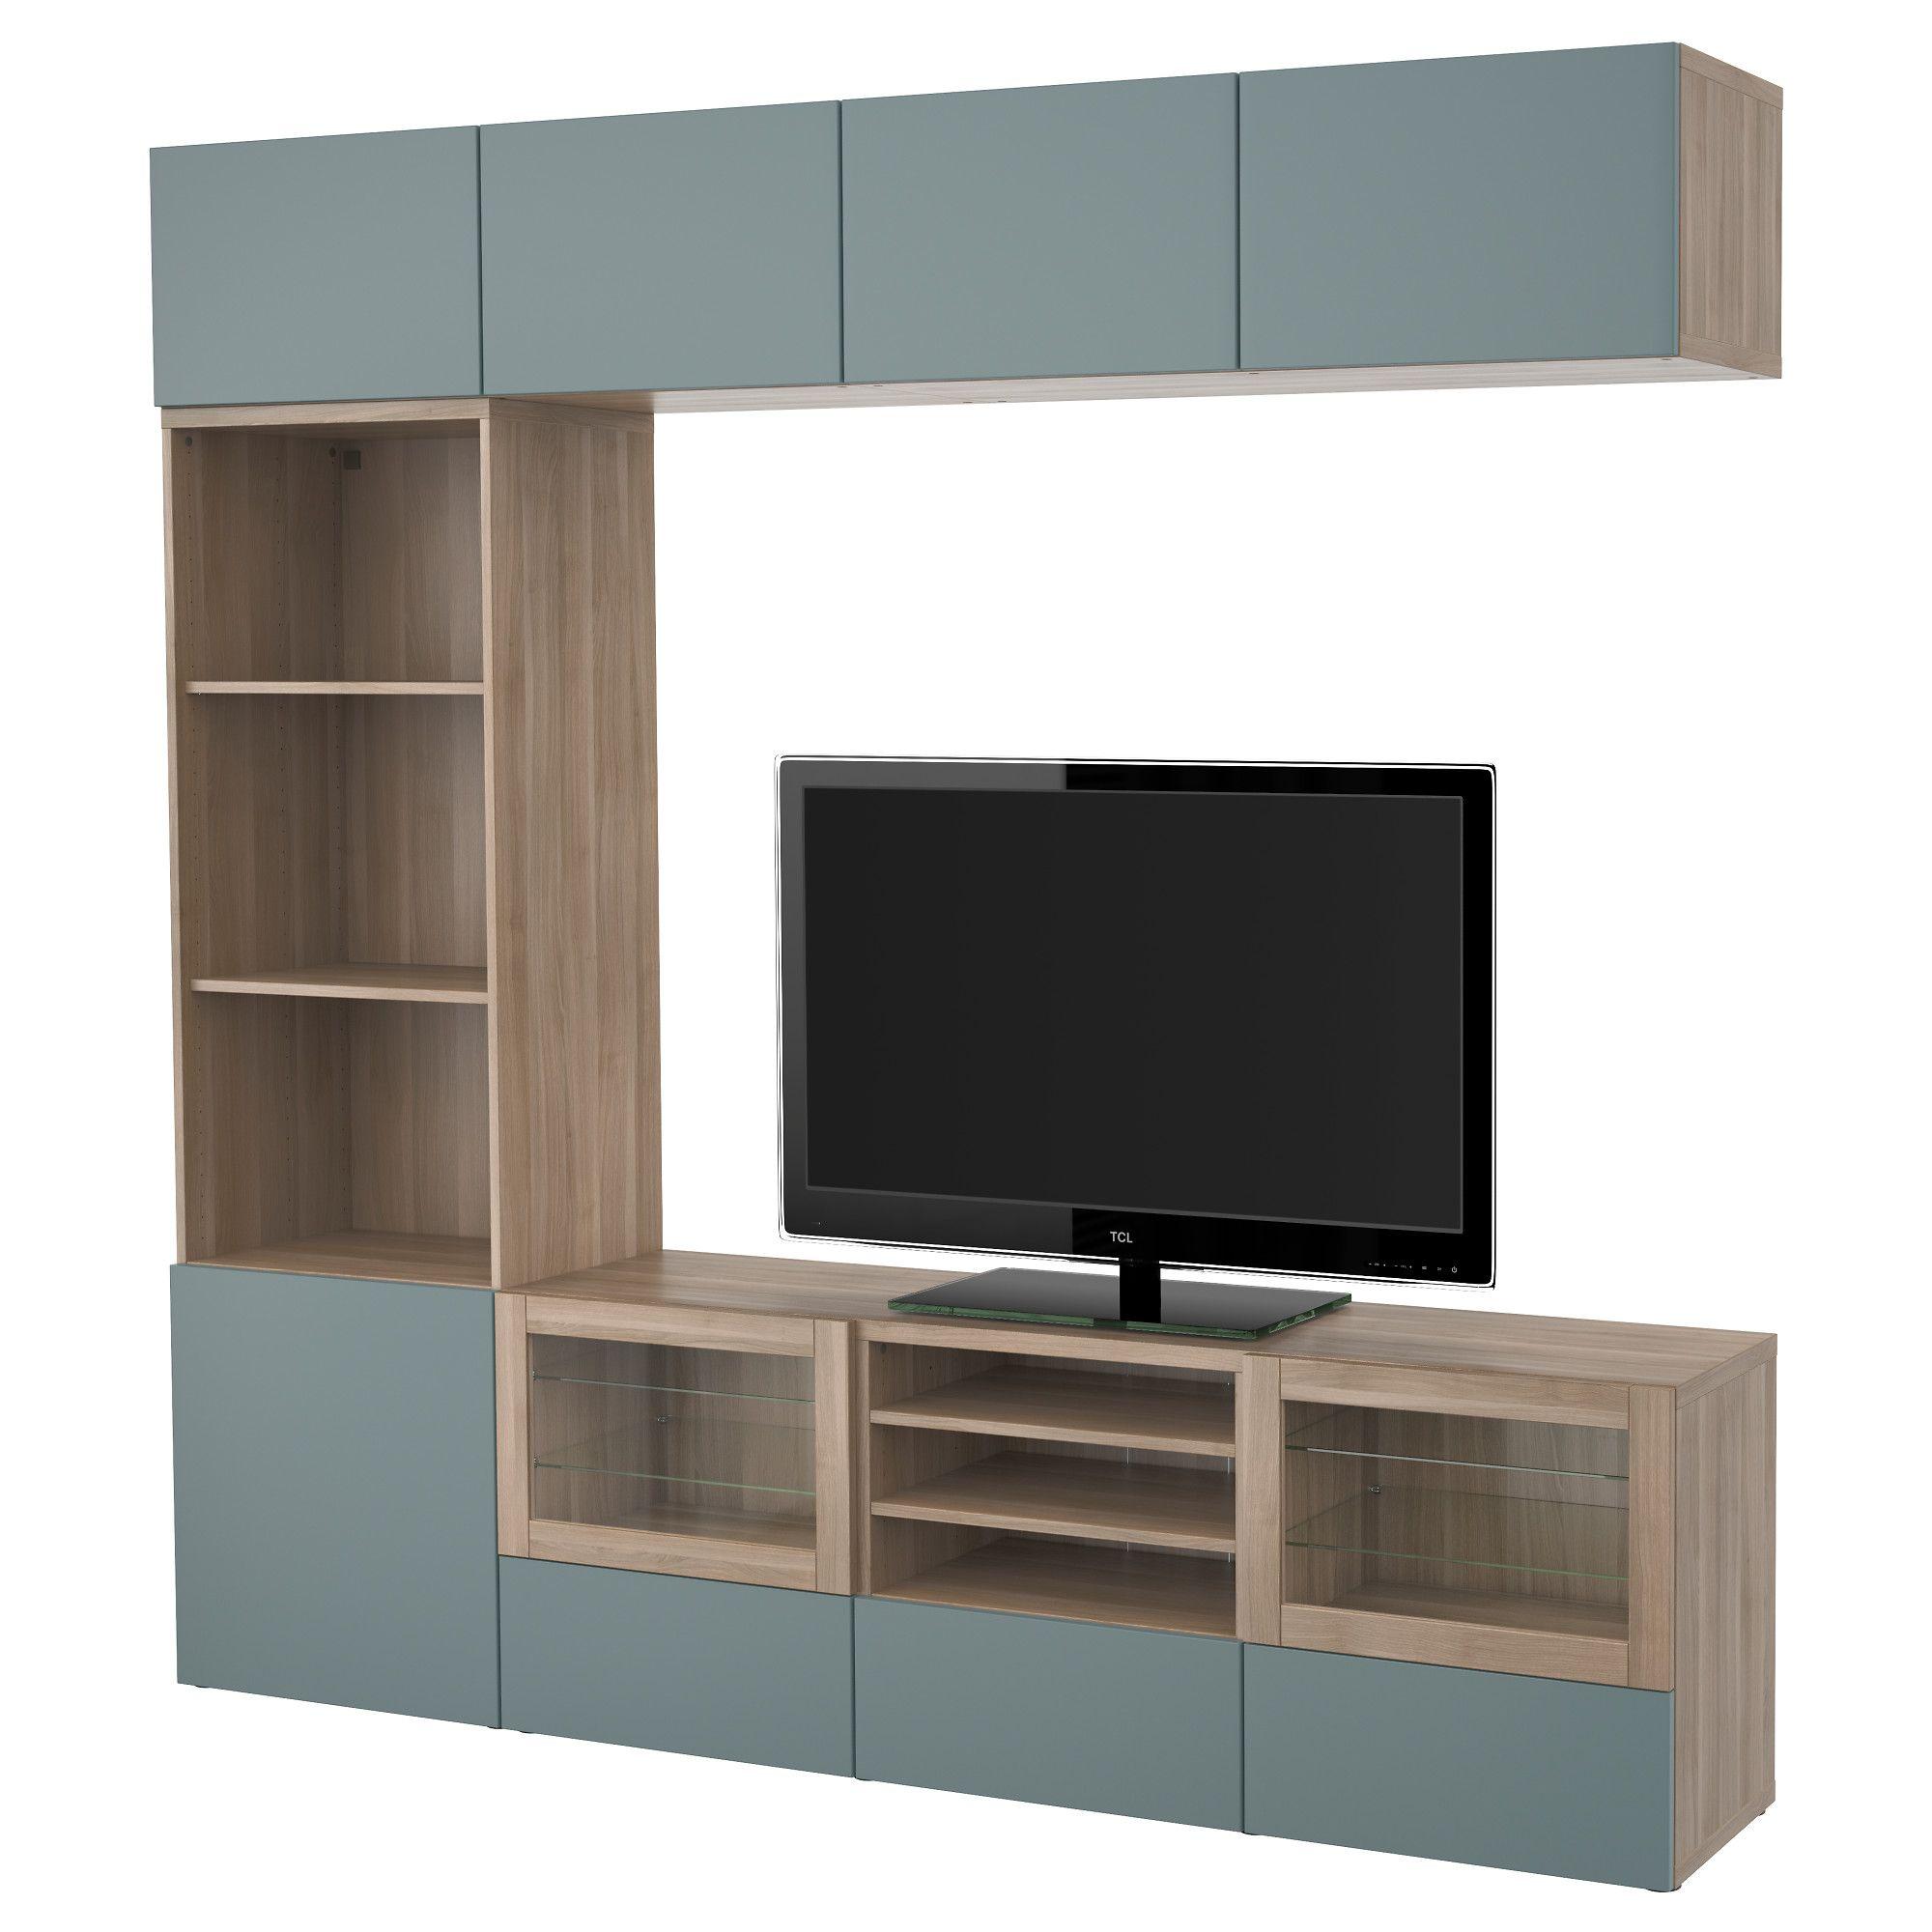 Pin By Ladendirekt On Tv Hifi Mobel Ikea Quality Furniture